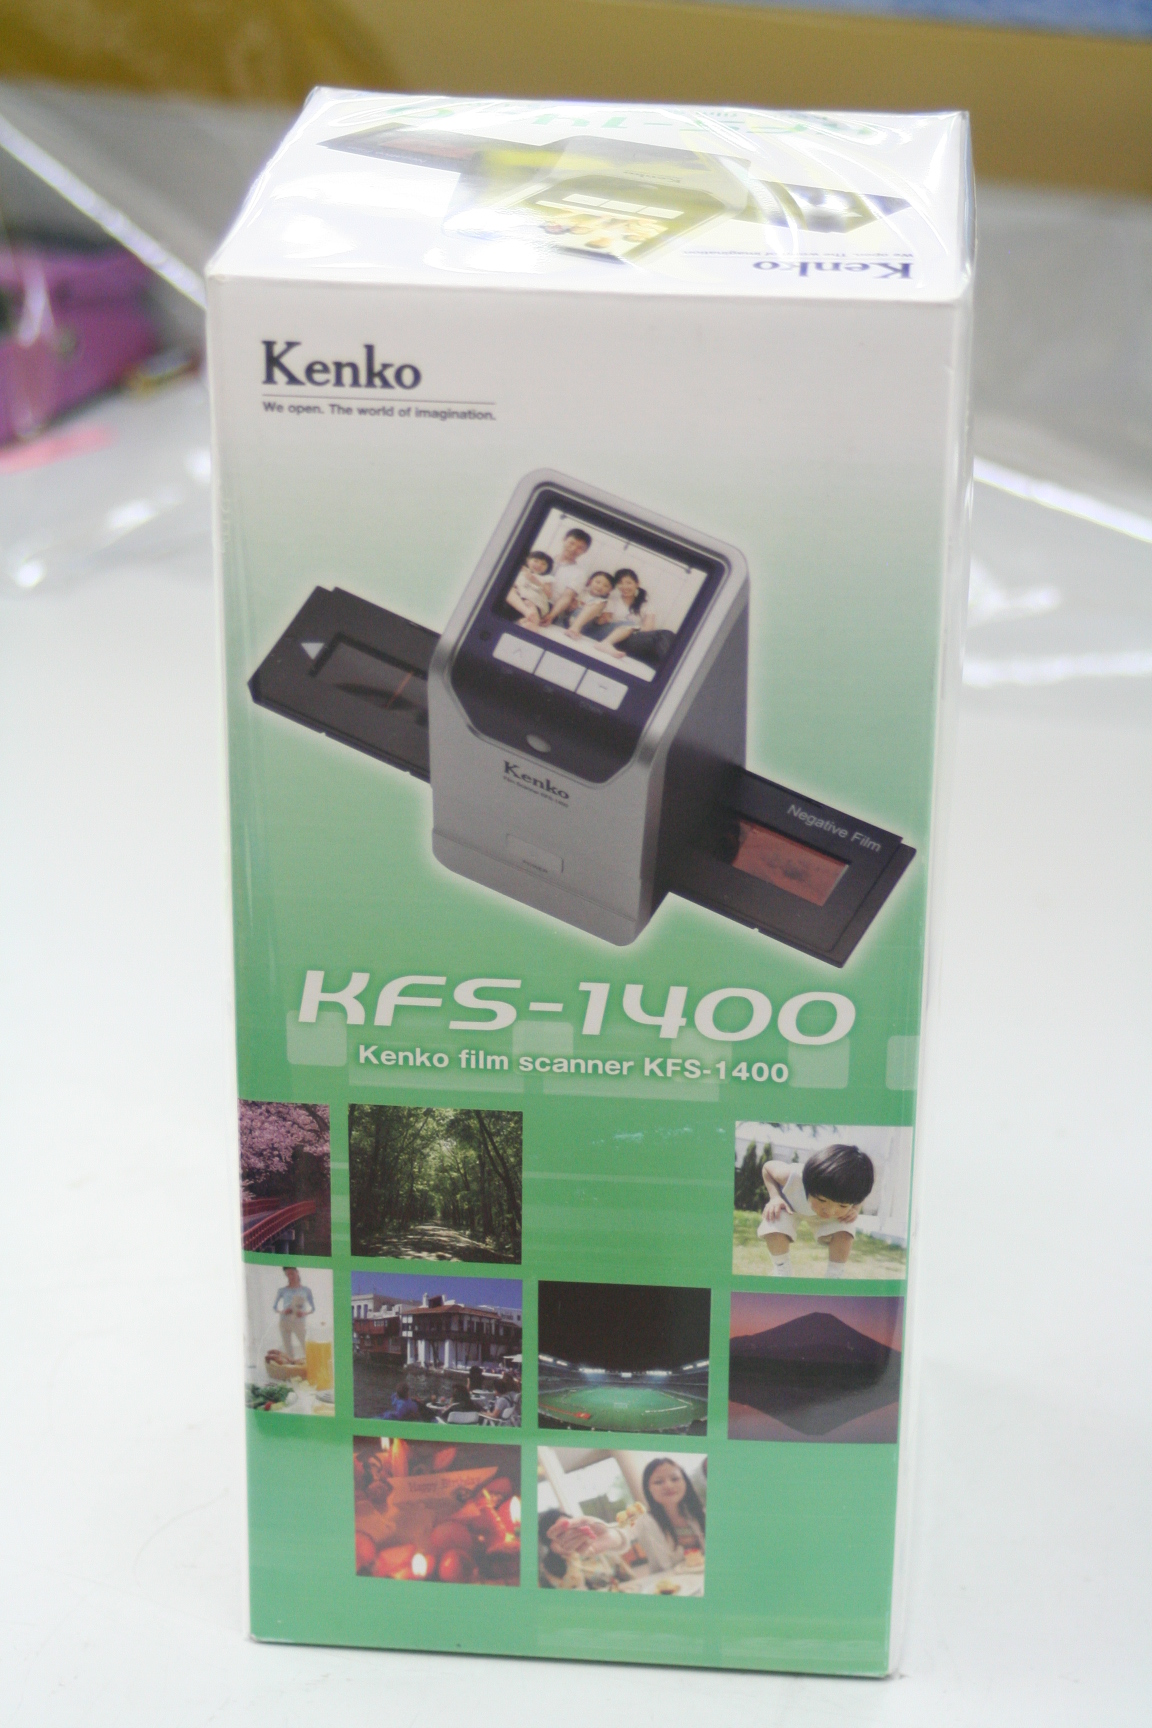 Kenkoフィルムスキャナー買取 名古屋リサイクルショップ ハードオフ三河安城